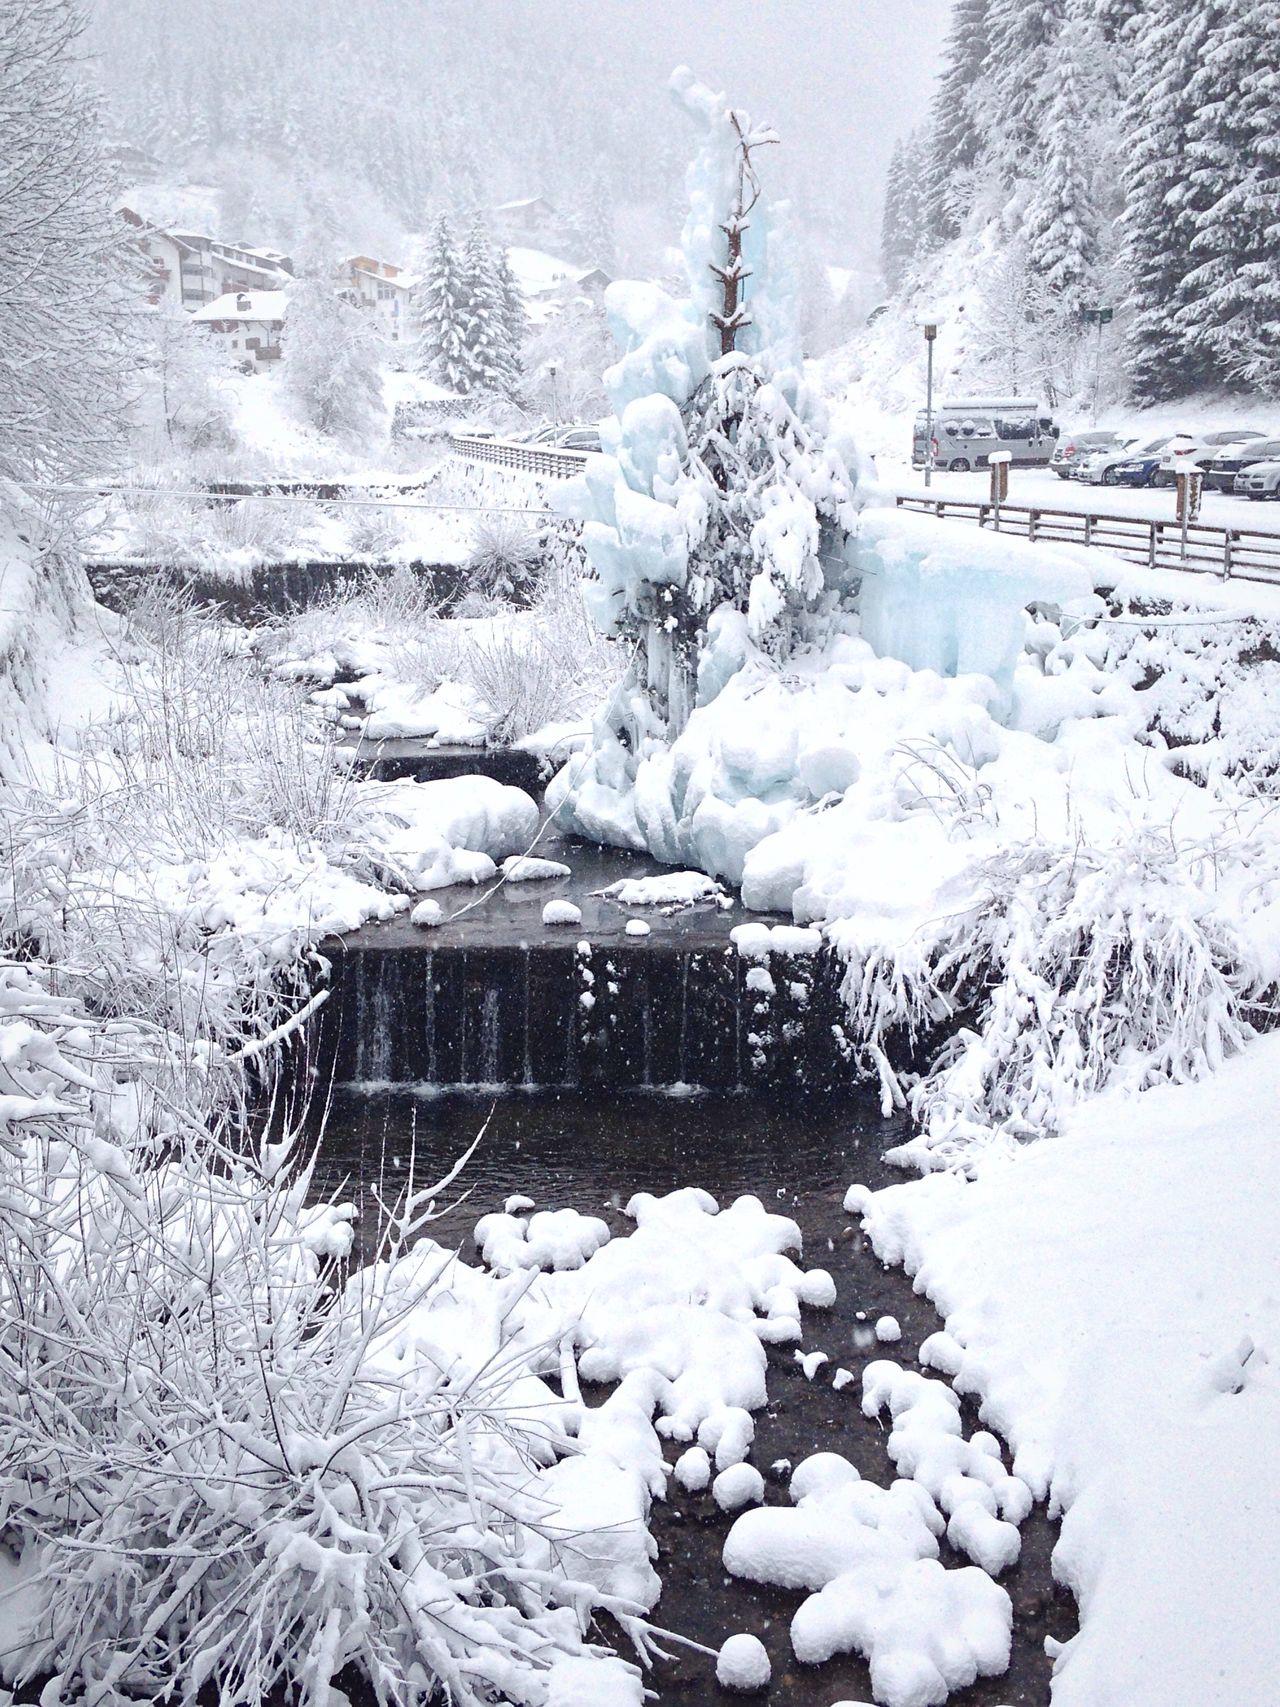 Water Snow Wintertime Winter Tree Frozen Nature Frozen Fir Tree Trentino Alto Adige Waterfall Welschnofen Nova Levante Bolzano - Bozen Bolzano Ice Nature